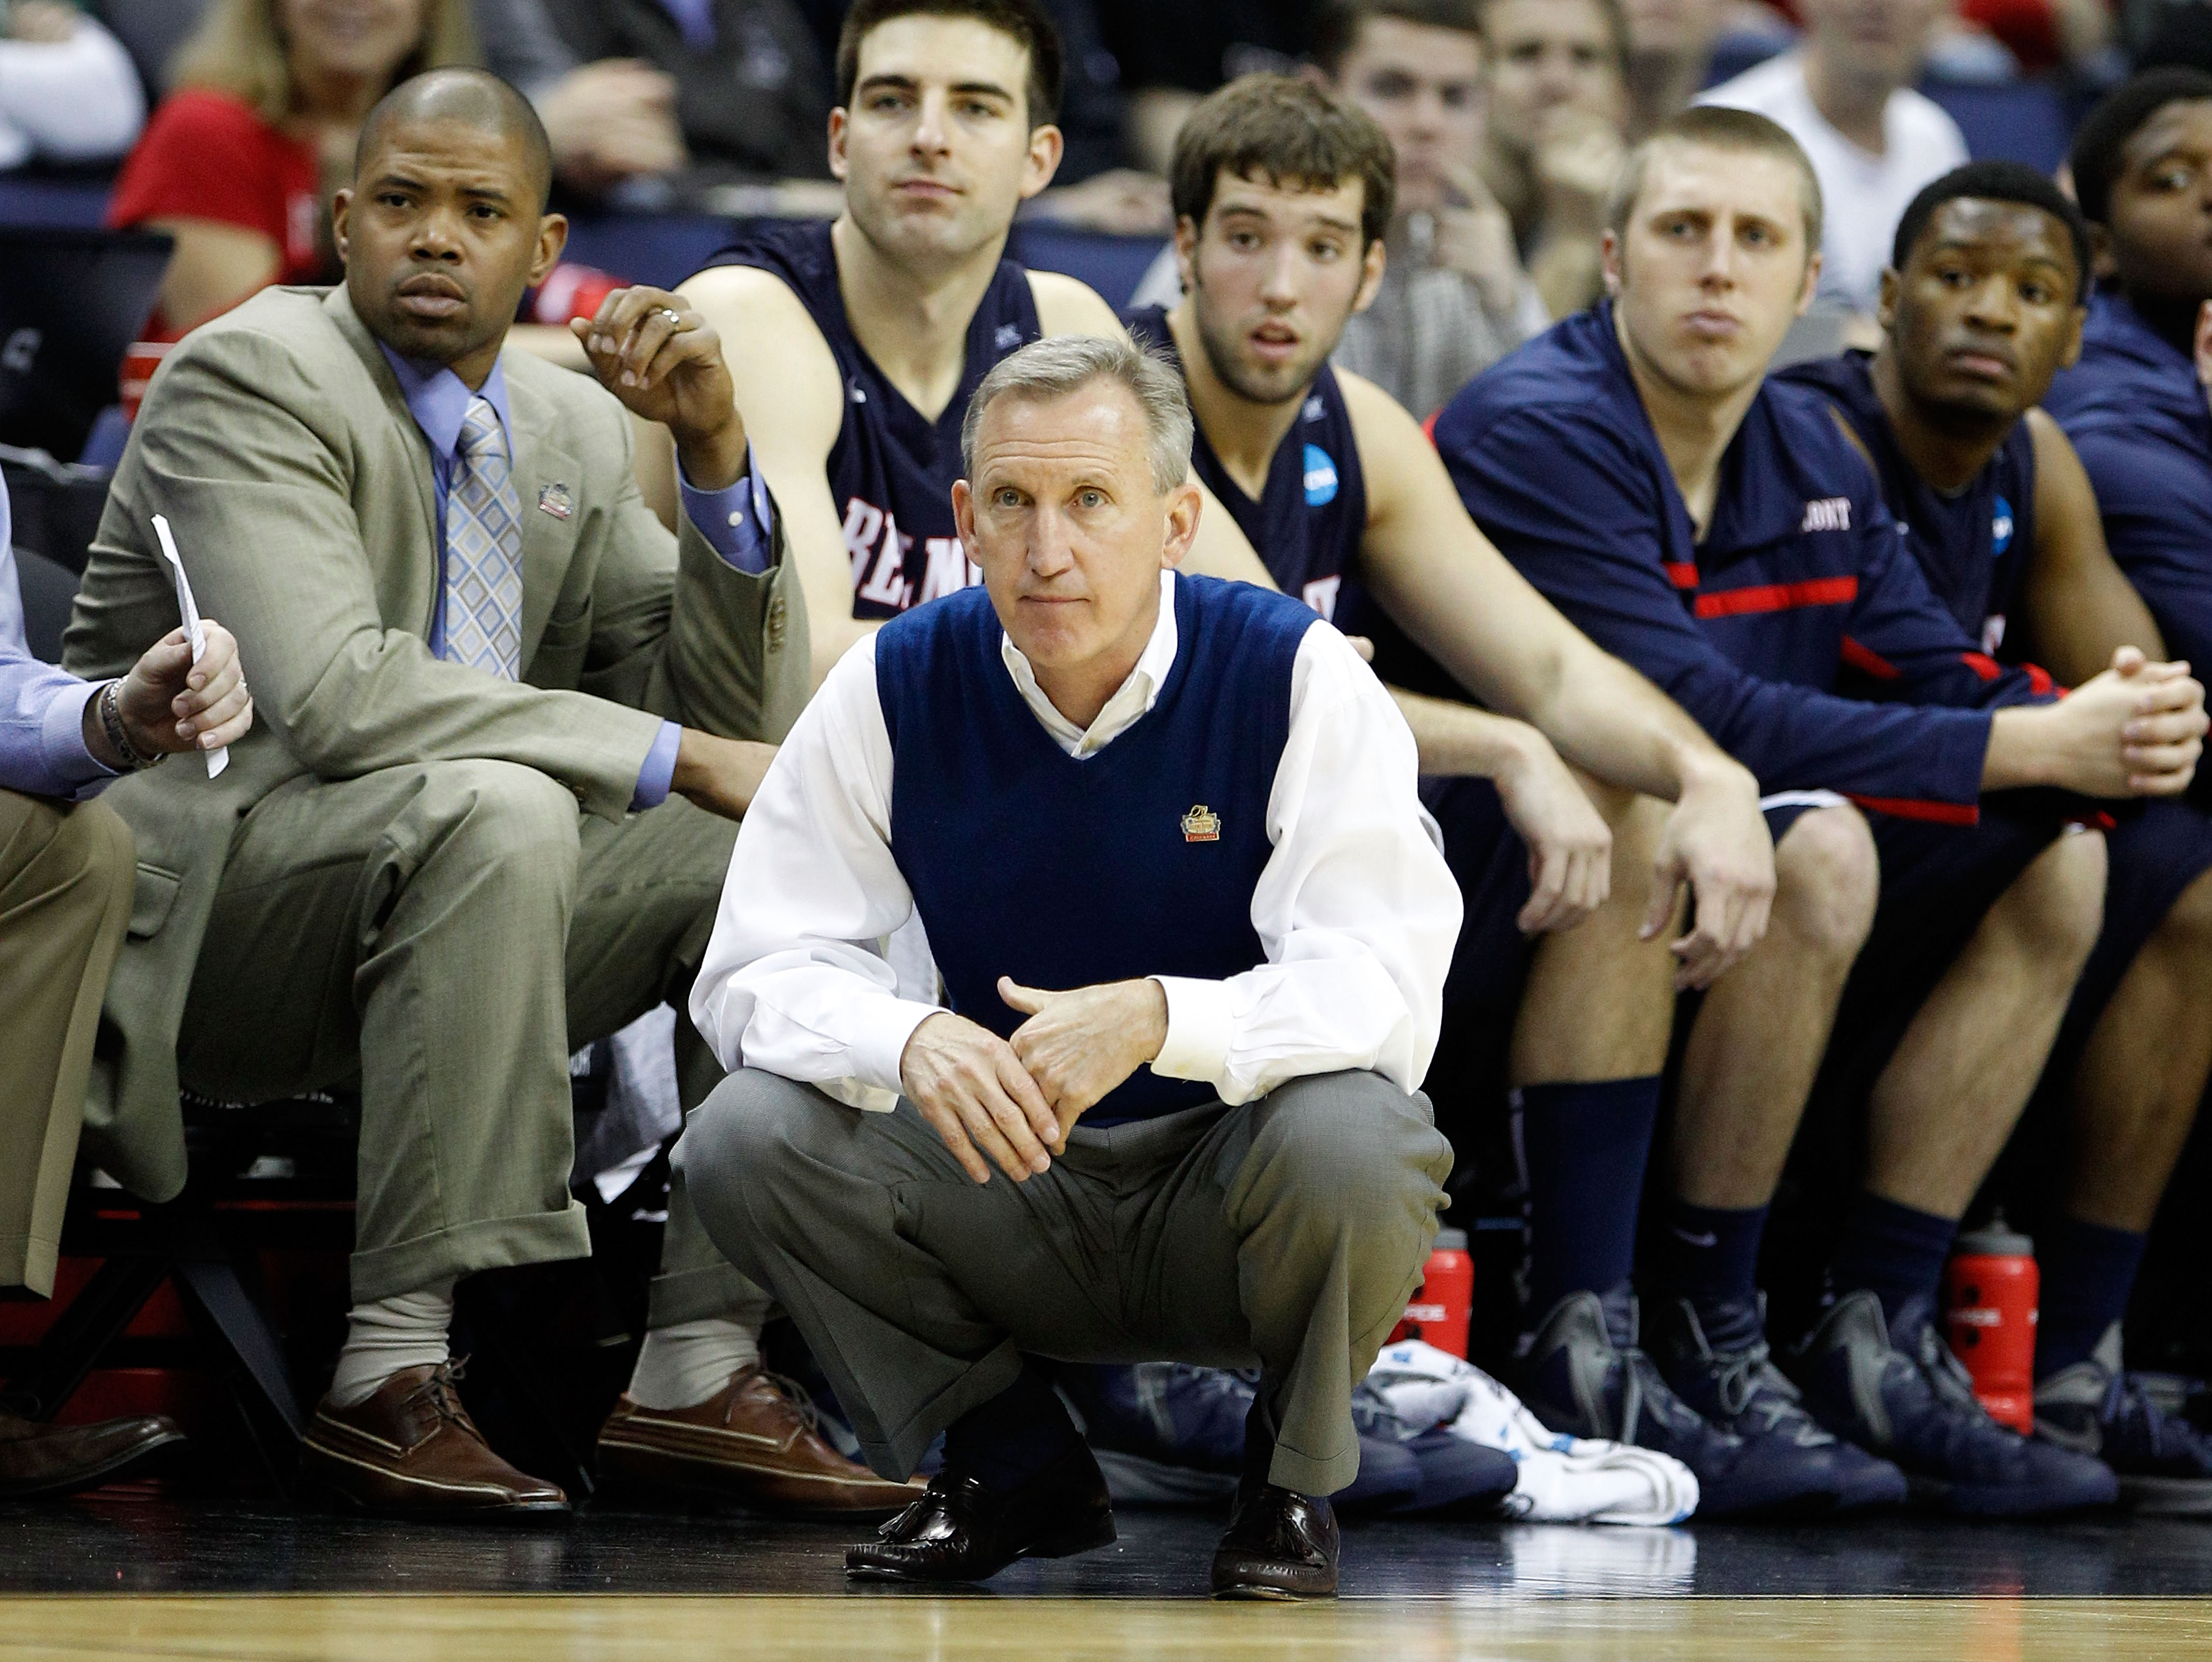 NCAA Basketball Tournament - Belmont v Georgetown